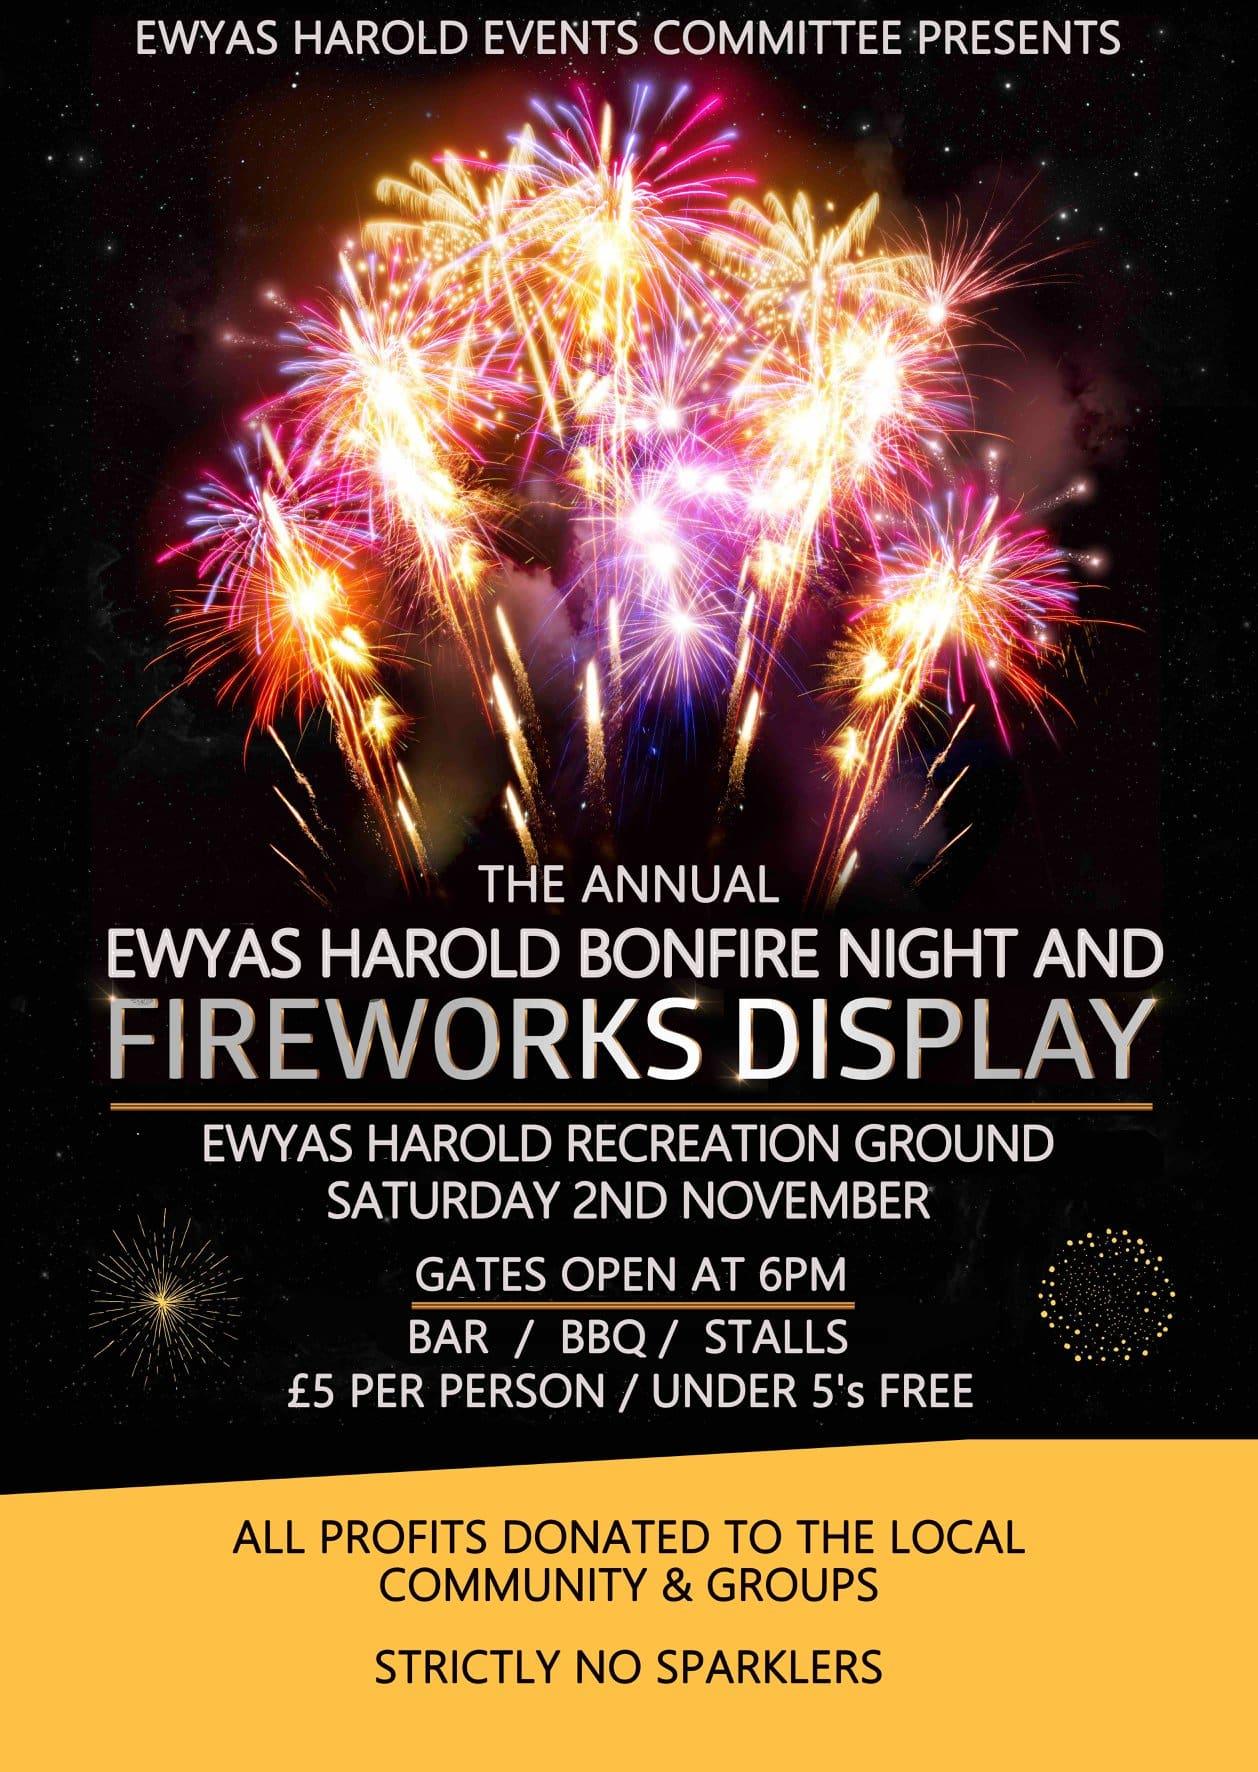 Ewyas Harold Bonfire Night and Fireworks Display